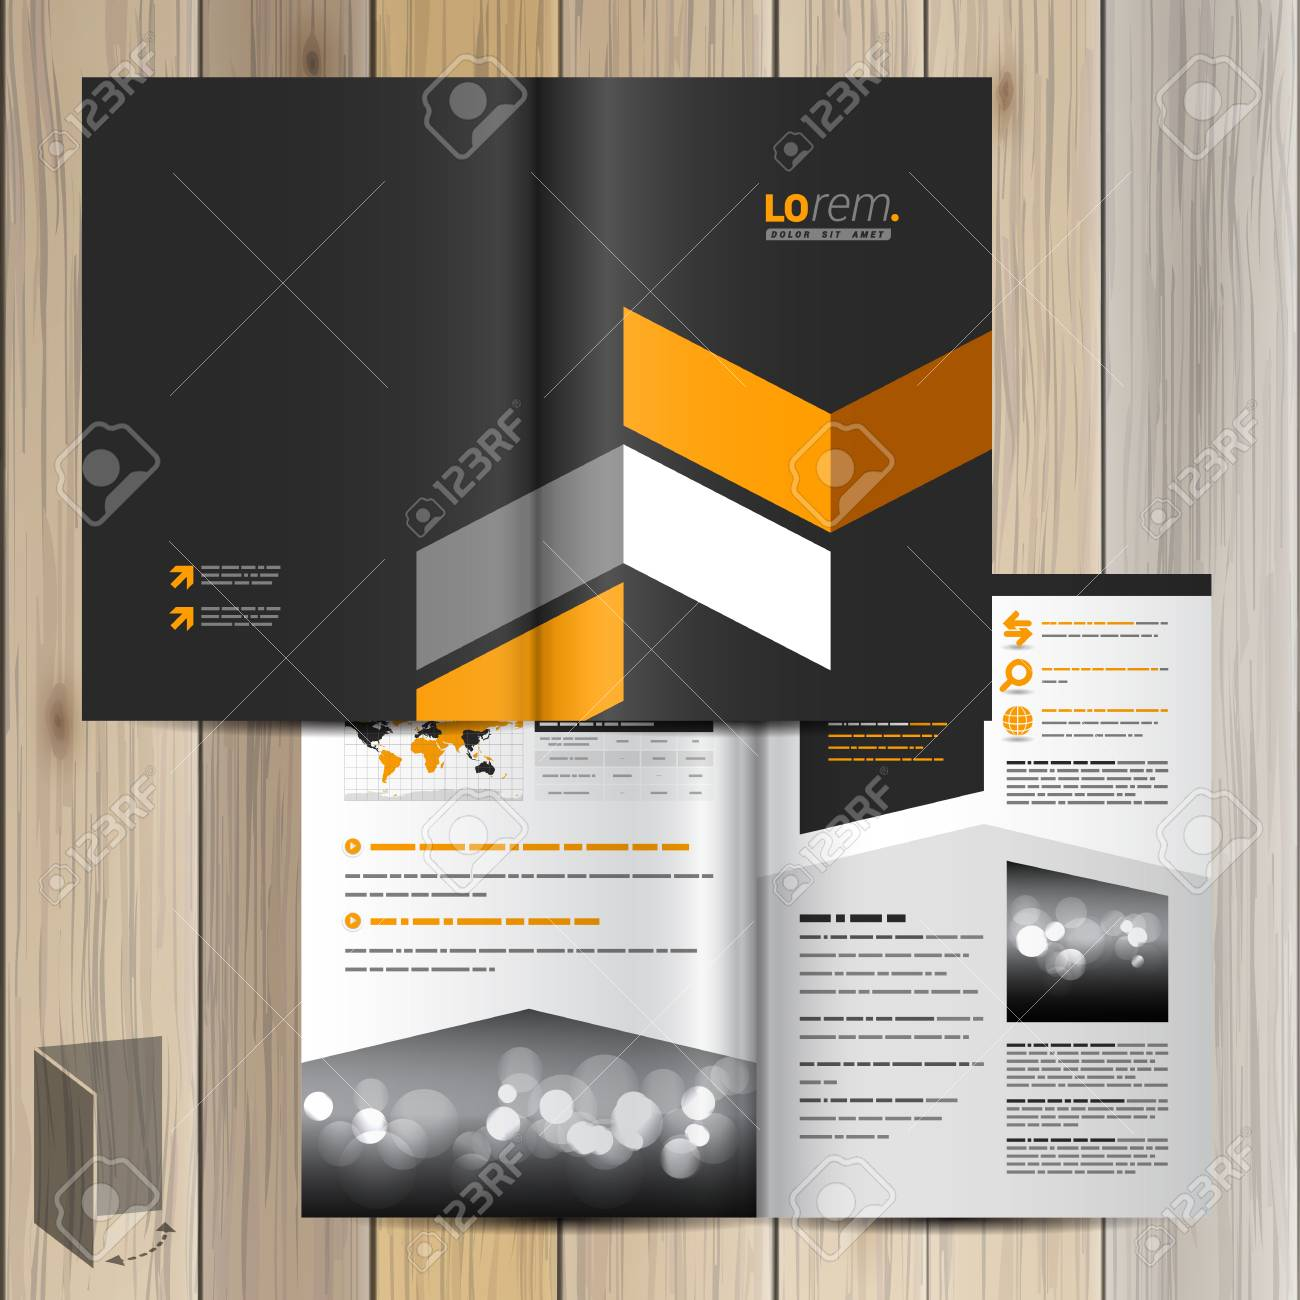 Classic Black Brochure Template Design With Yellow Geometric